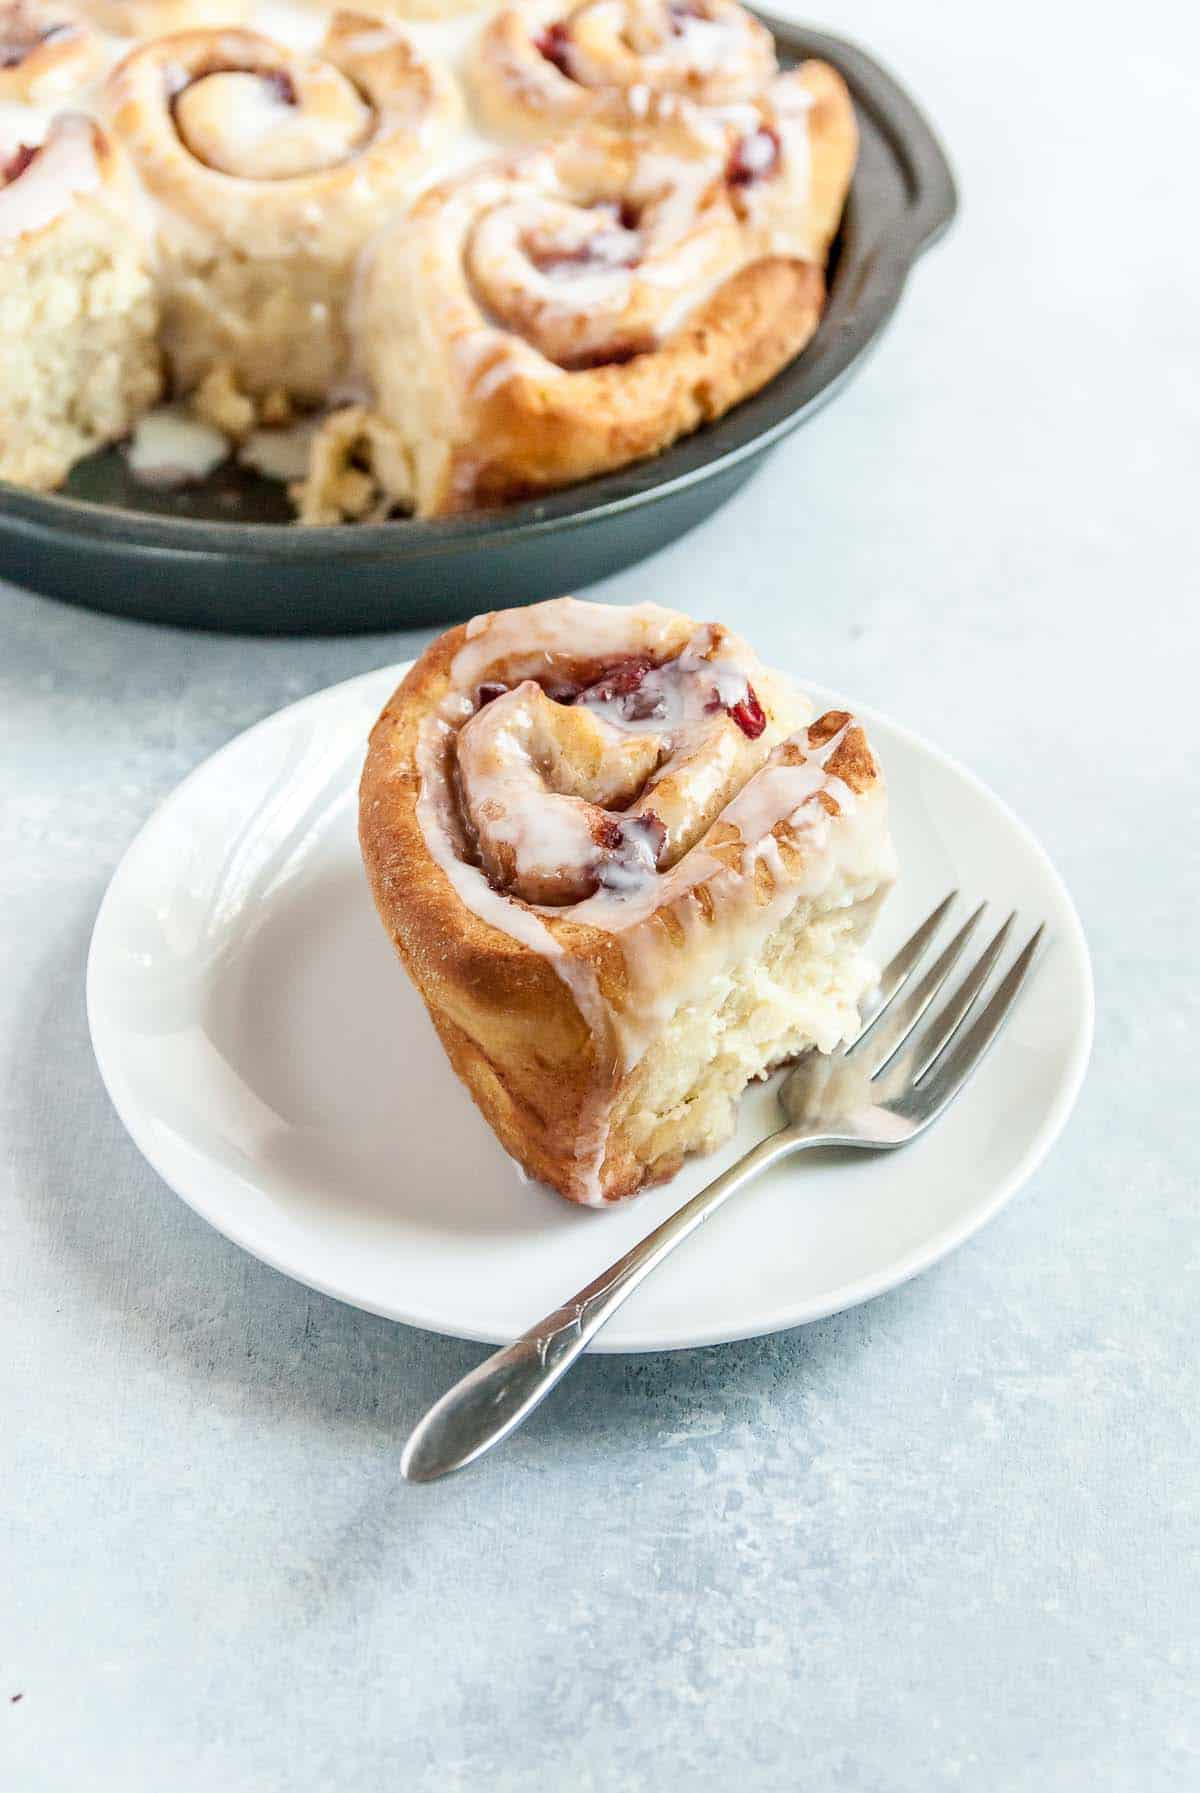 vegan cherry cinnamon roll on plate